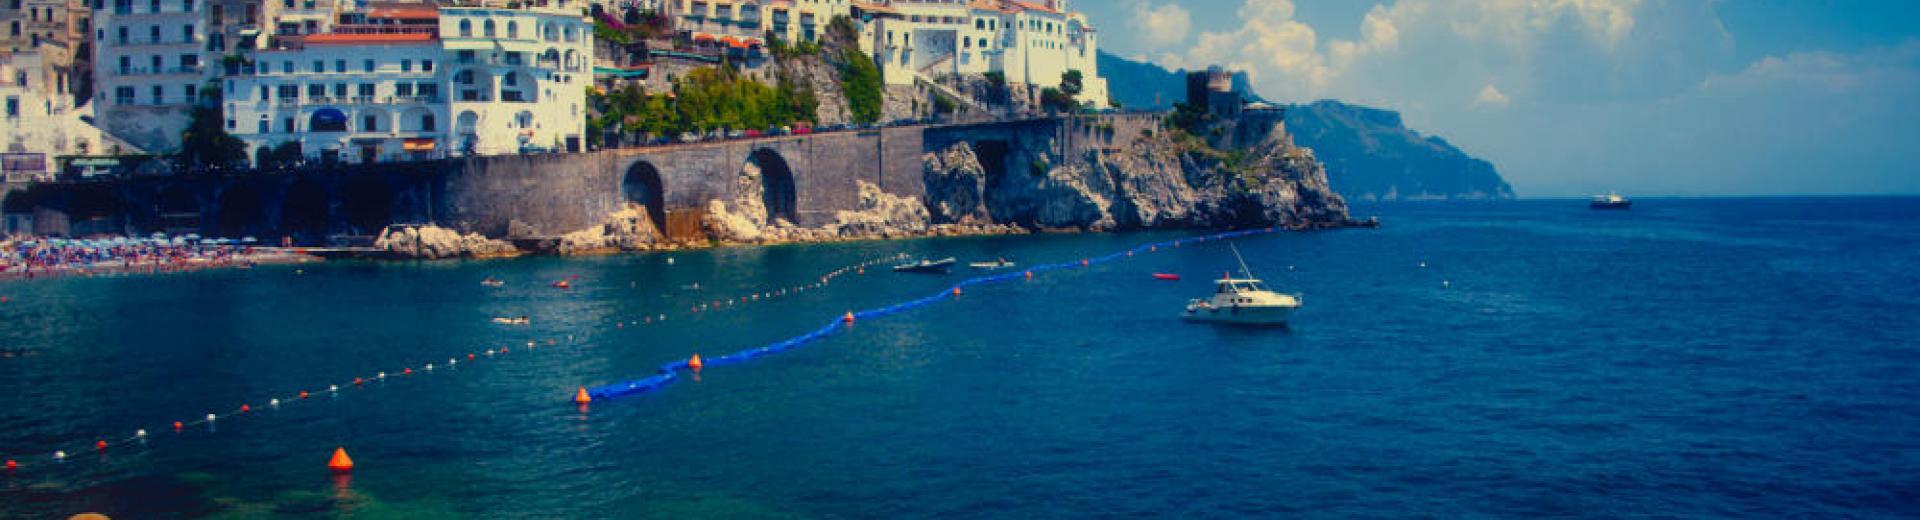 The Amalfi Coast from the ocean